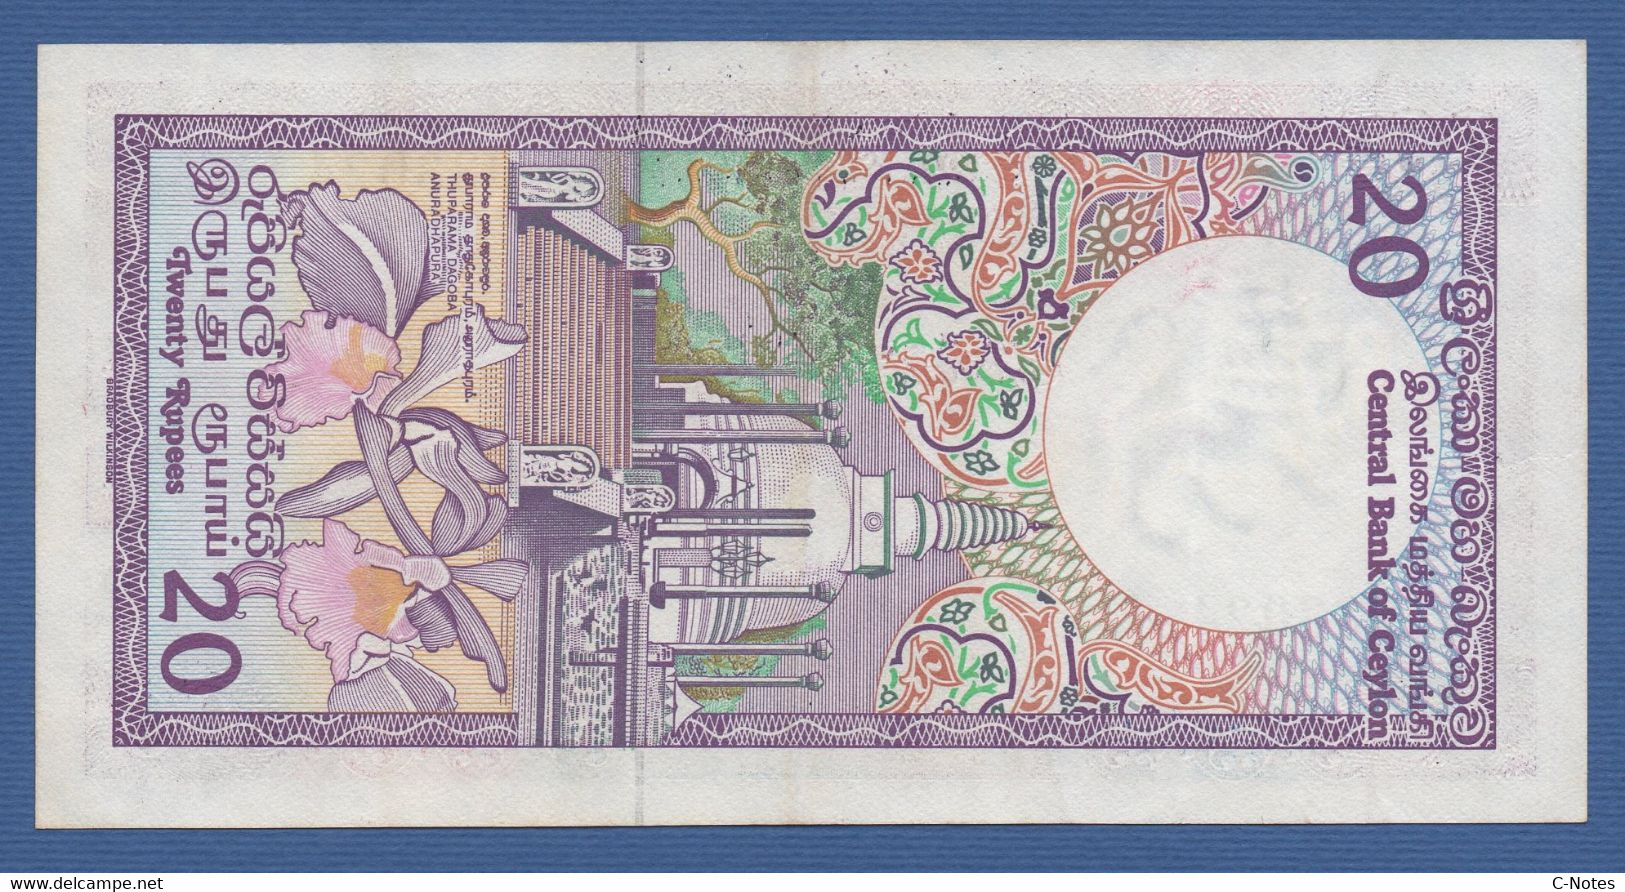 CEYLON & SRI LANKA - Central Bank Of Ceylon - P.93b – 20 RUPEES 1985 VF/XF Serie F/21 033024 - Sri Lanka